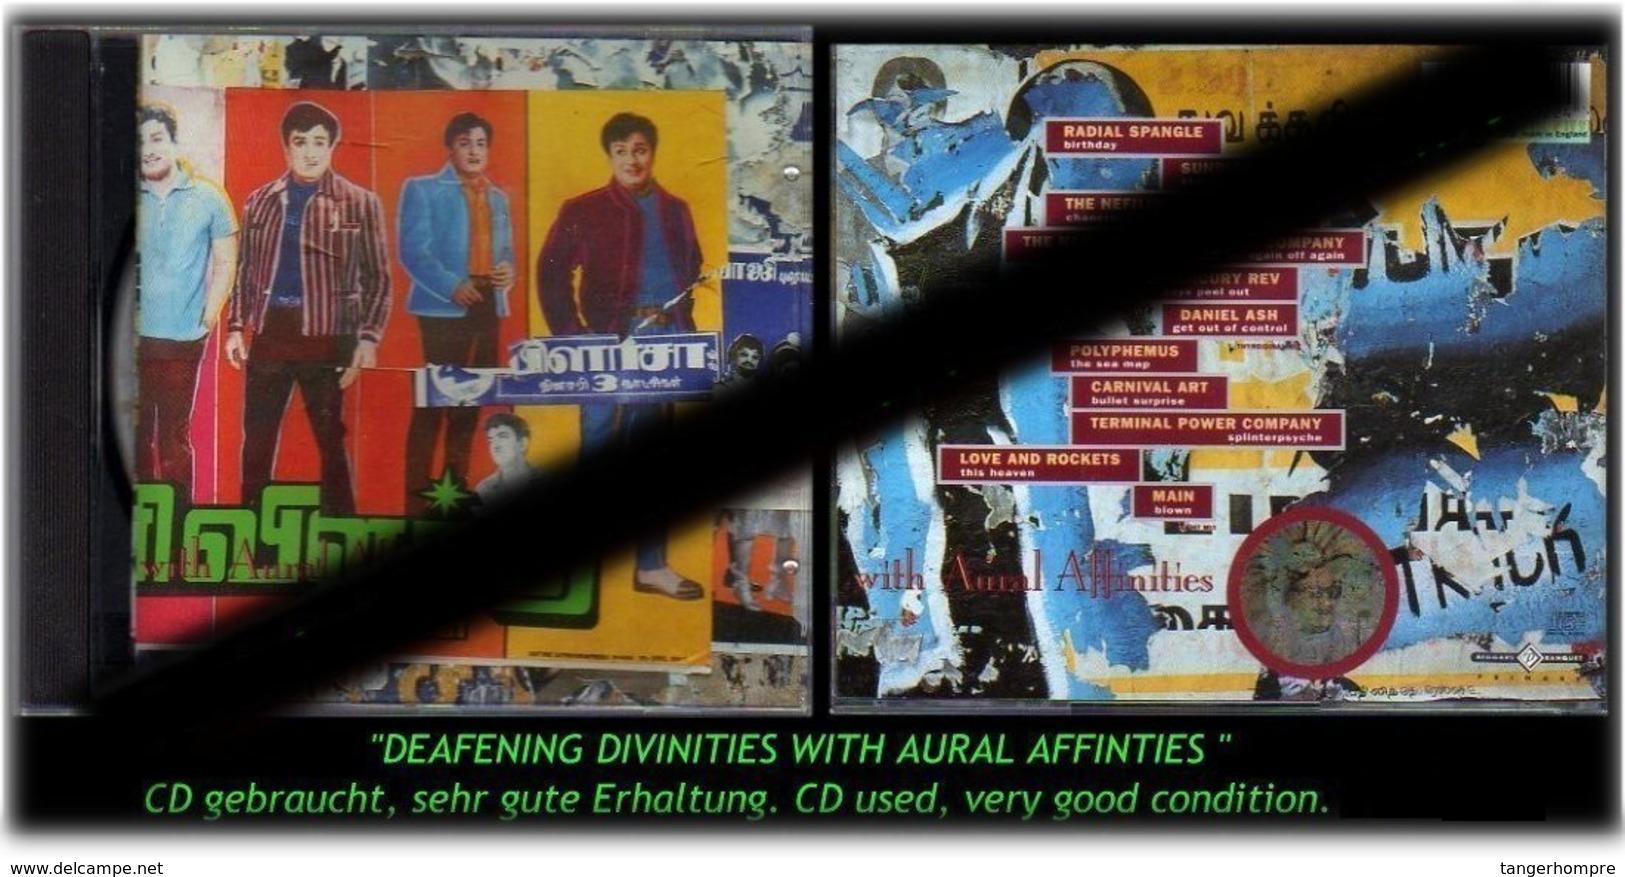 """DEAEFENING DIVINITIES WITH AURAL AFFINTIES"" - Hard Rock & Metal"